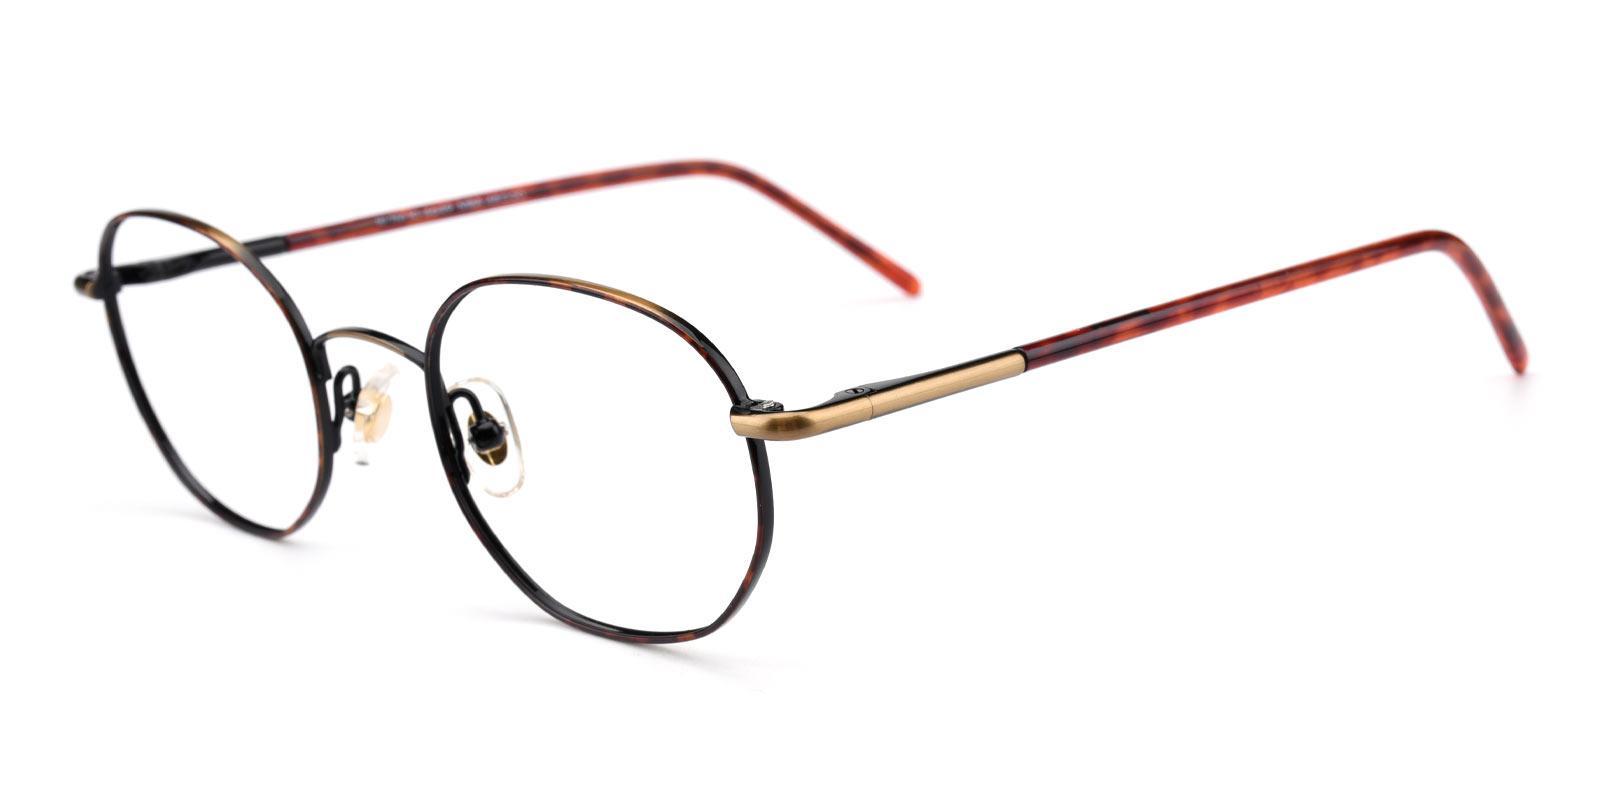 Marcus-Tortoise-Oval-Metal-Eyeglasses-detail